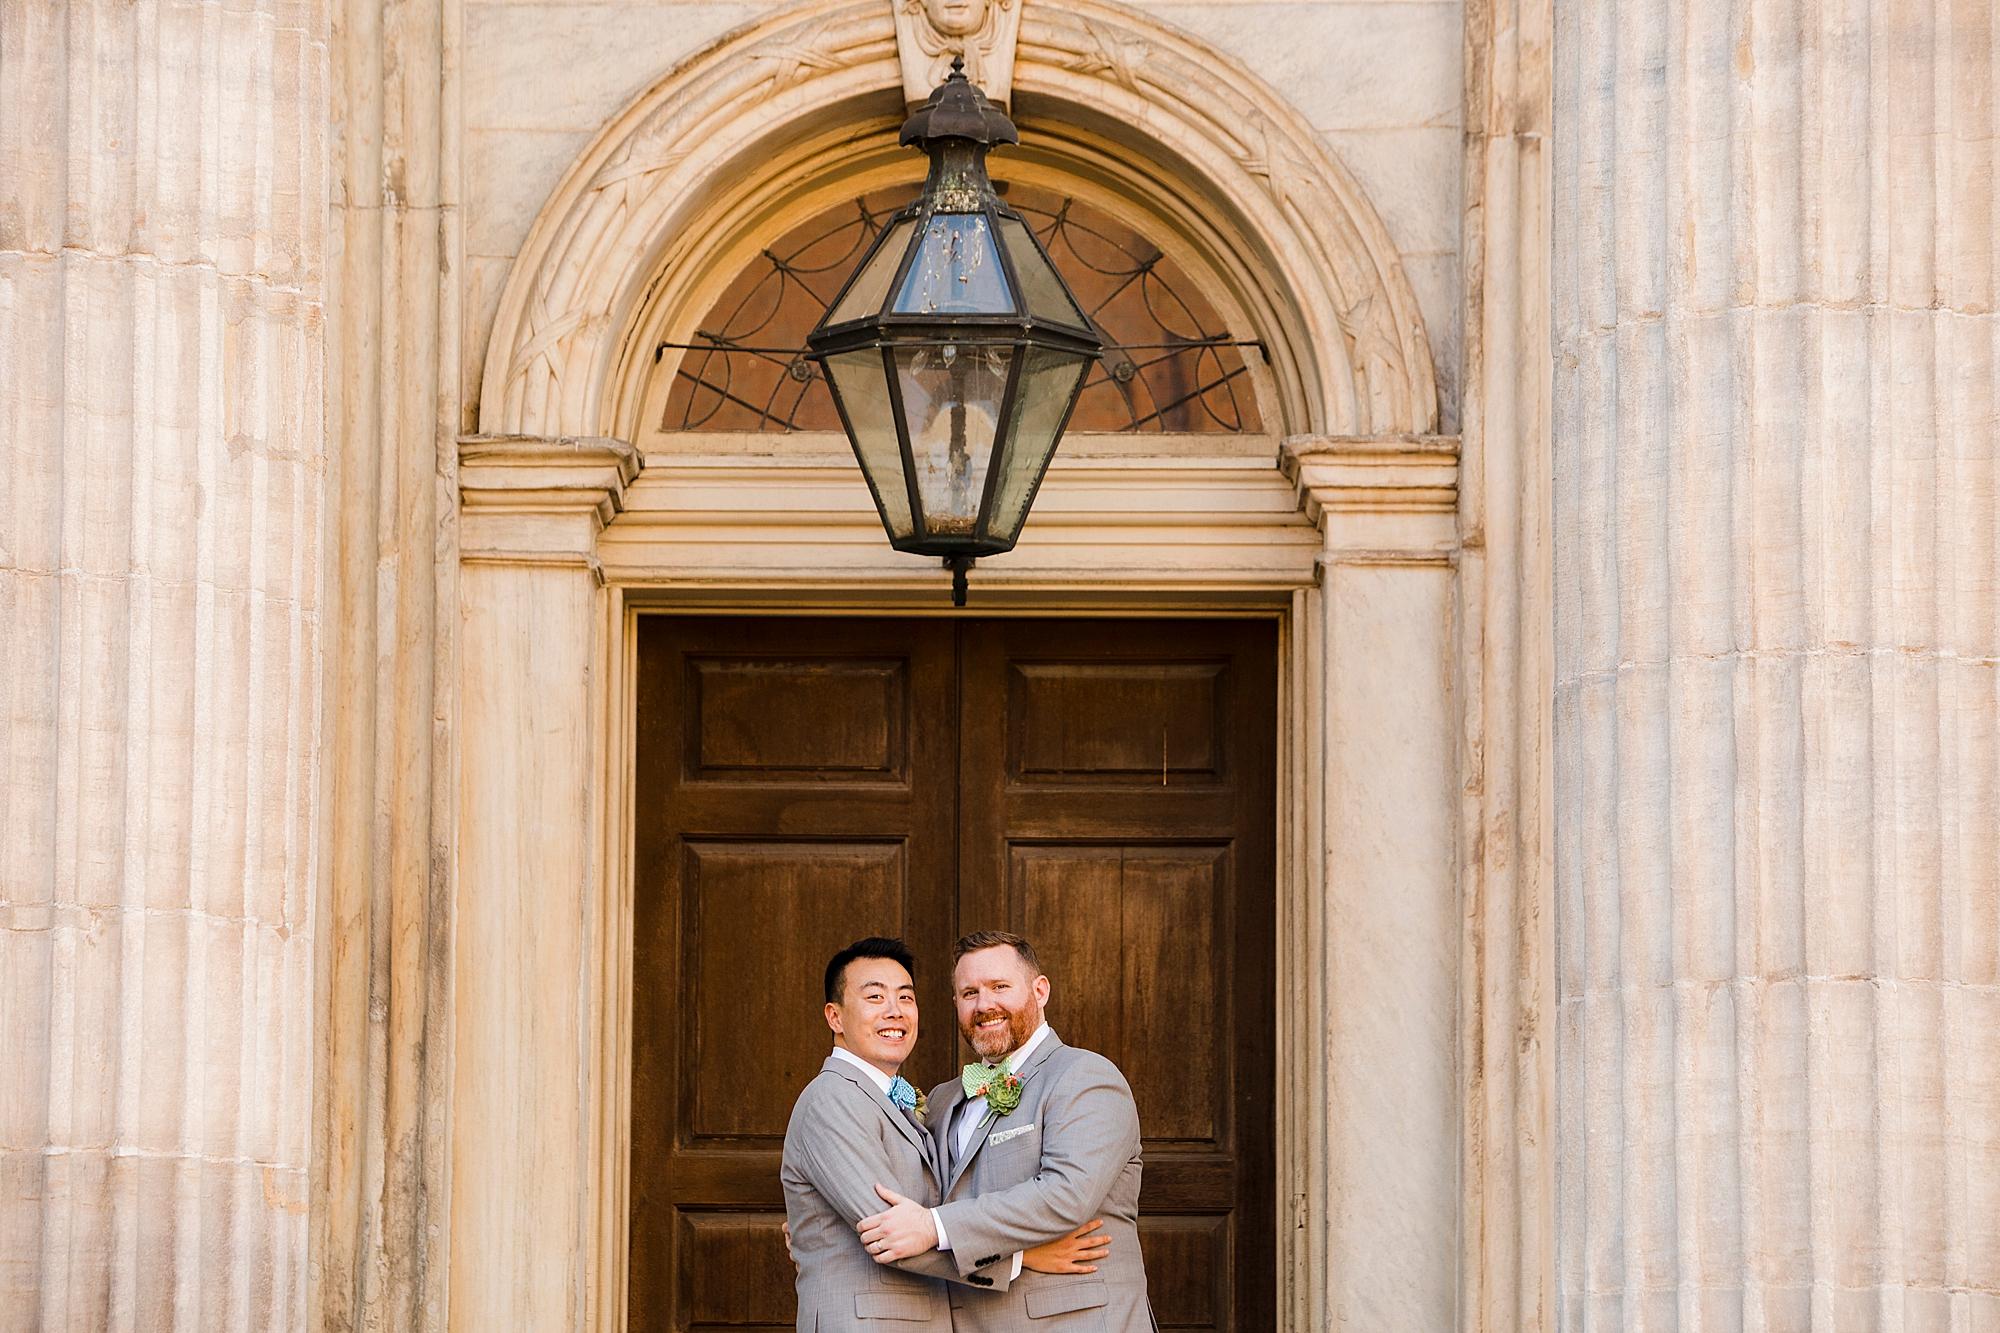 Dam_Byron_Love_By_Joe_Mac_Independence_Visitor_Center_Gay_Wedding_LGBTQ_Philadelphia_Photography__0154.jpg